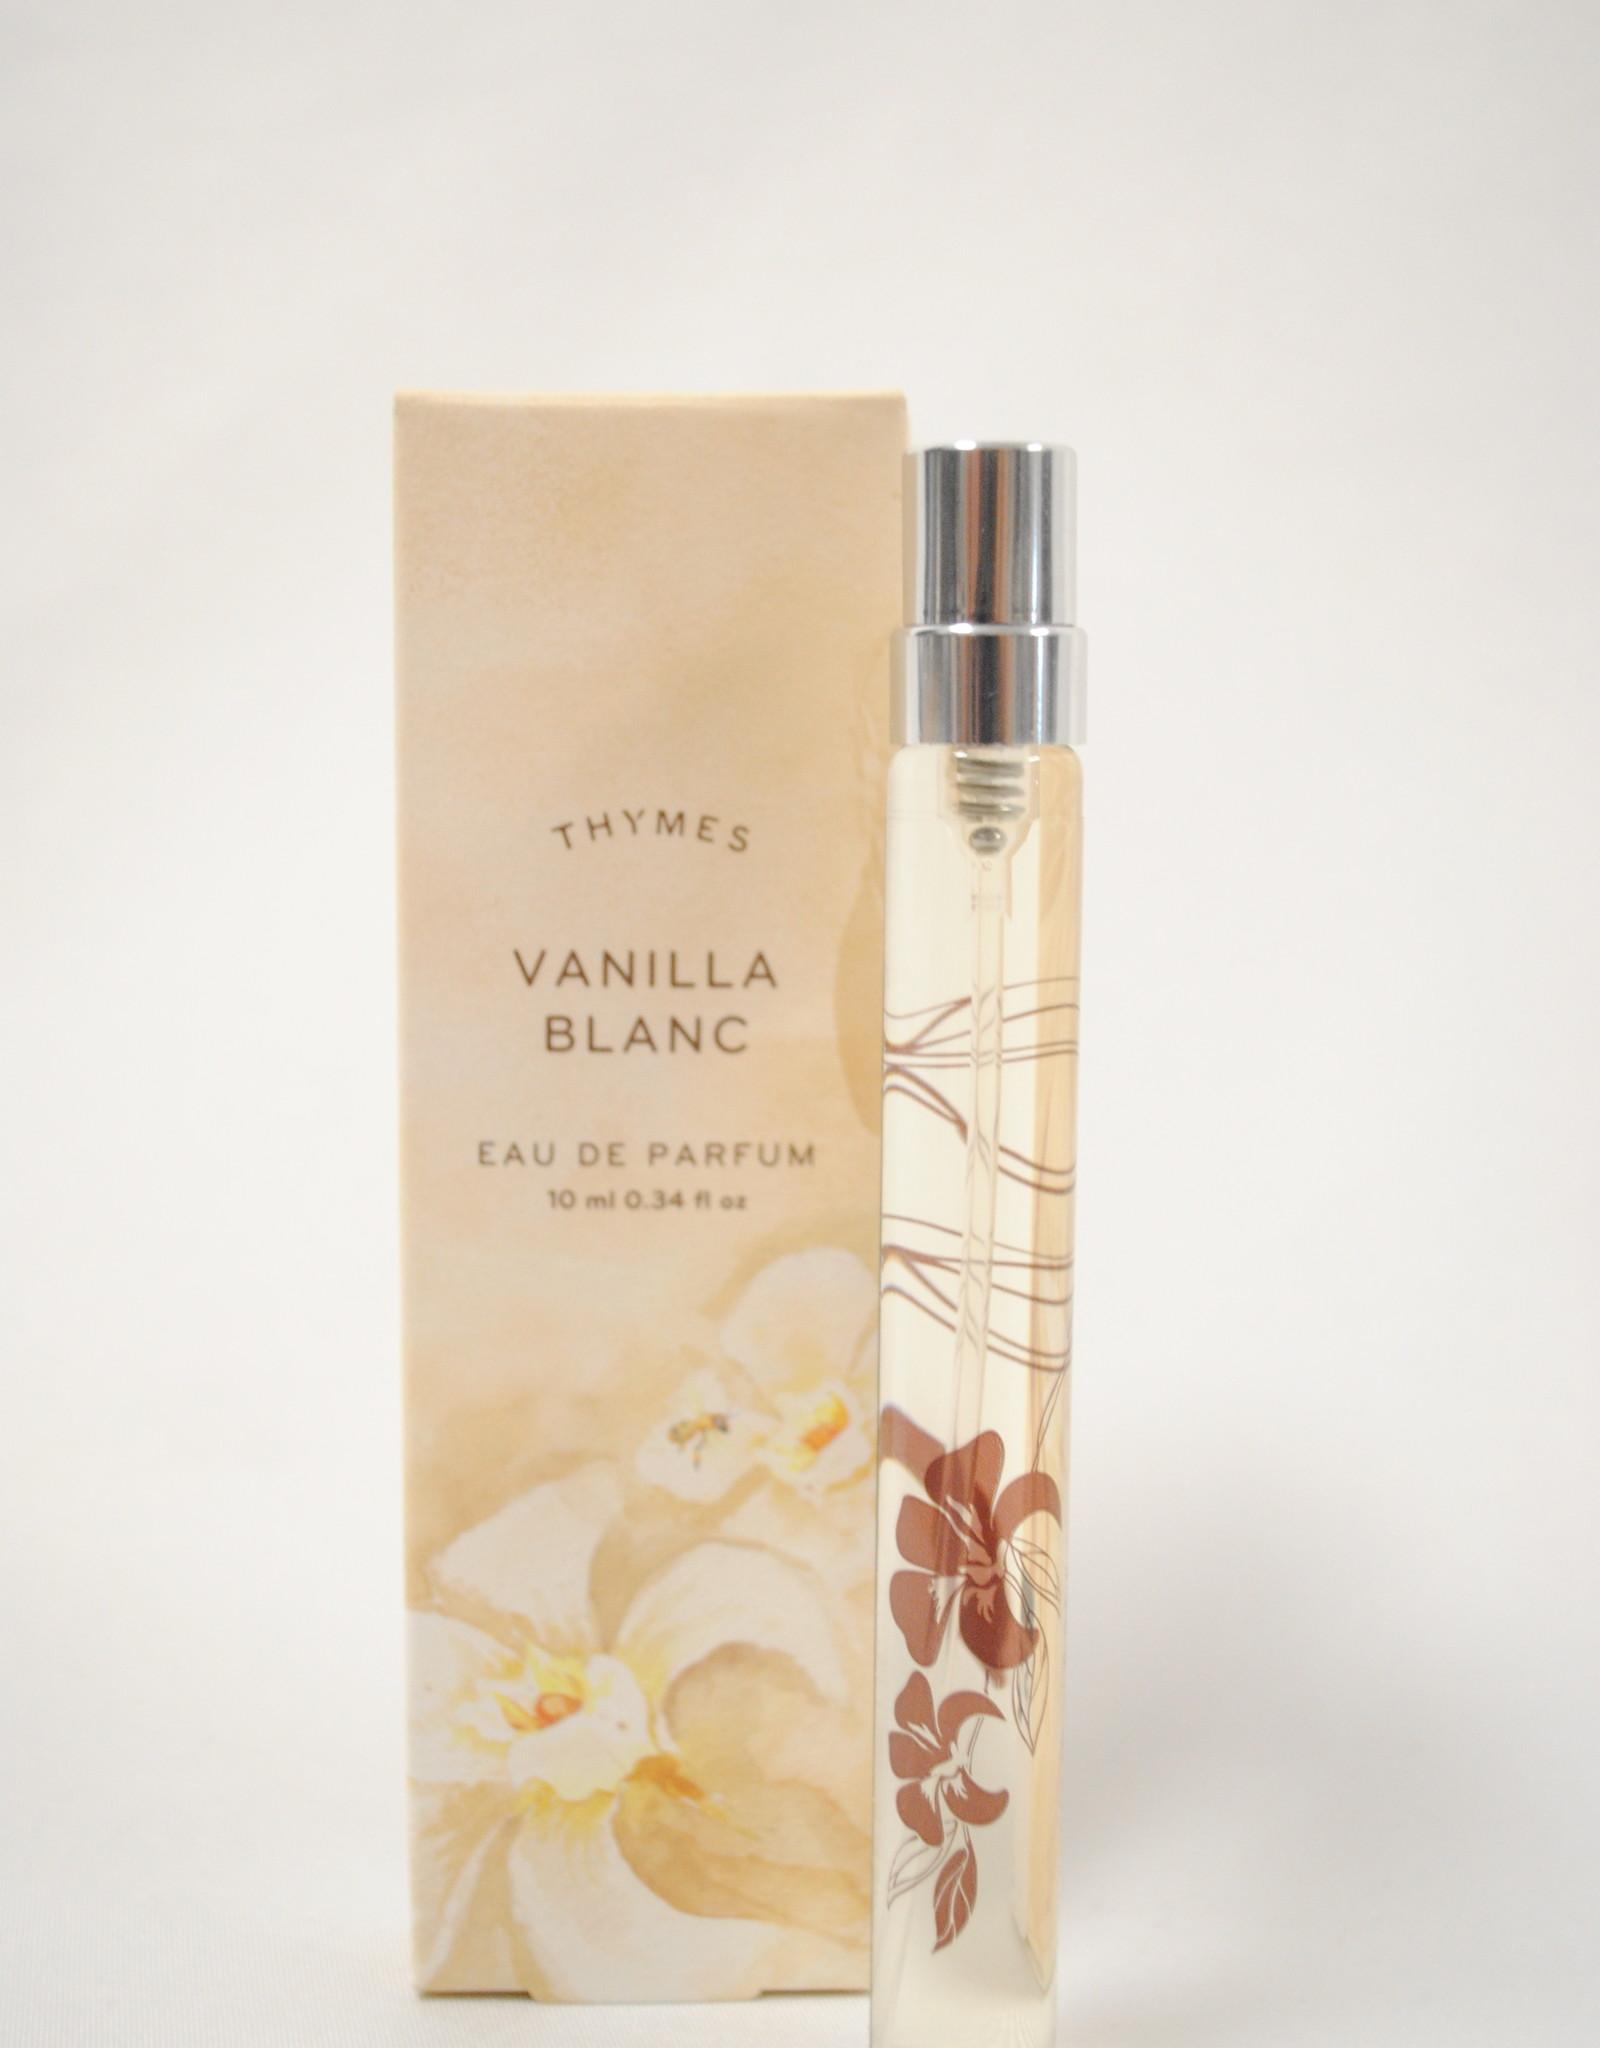 Thymes Vanilla Blanc Eau De Parfume